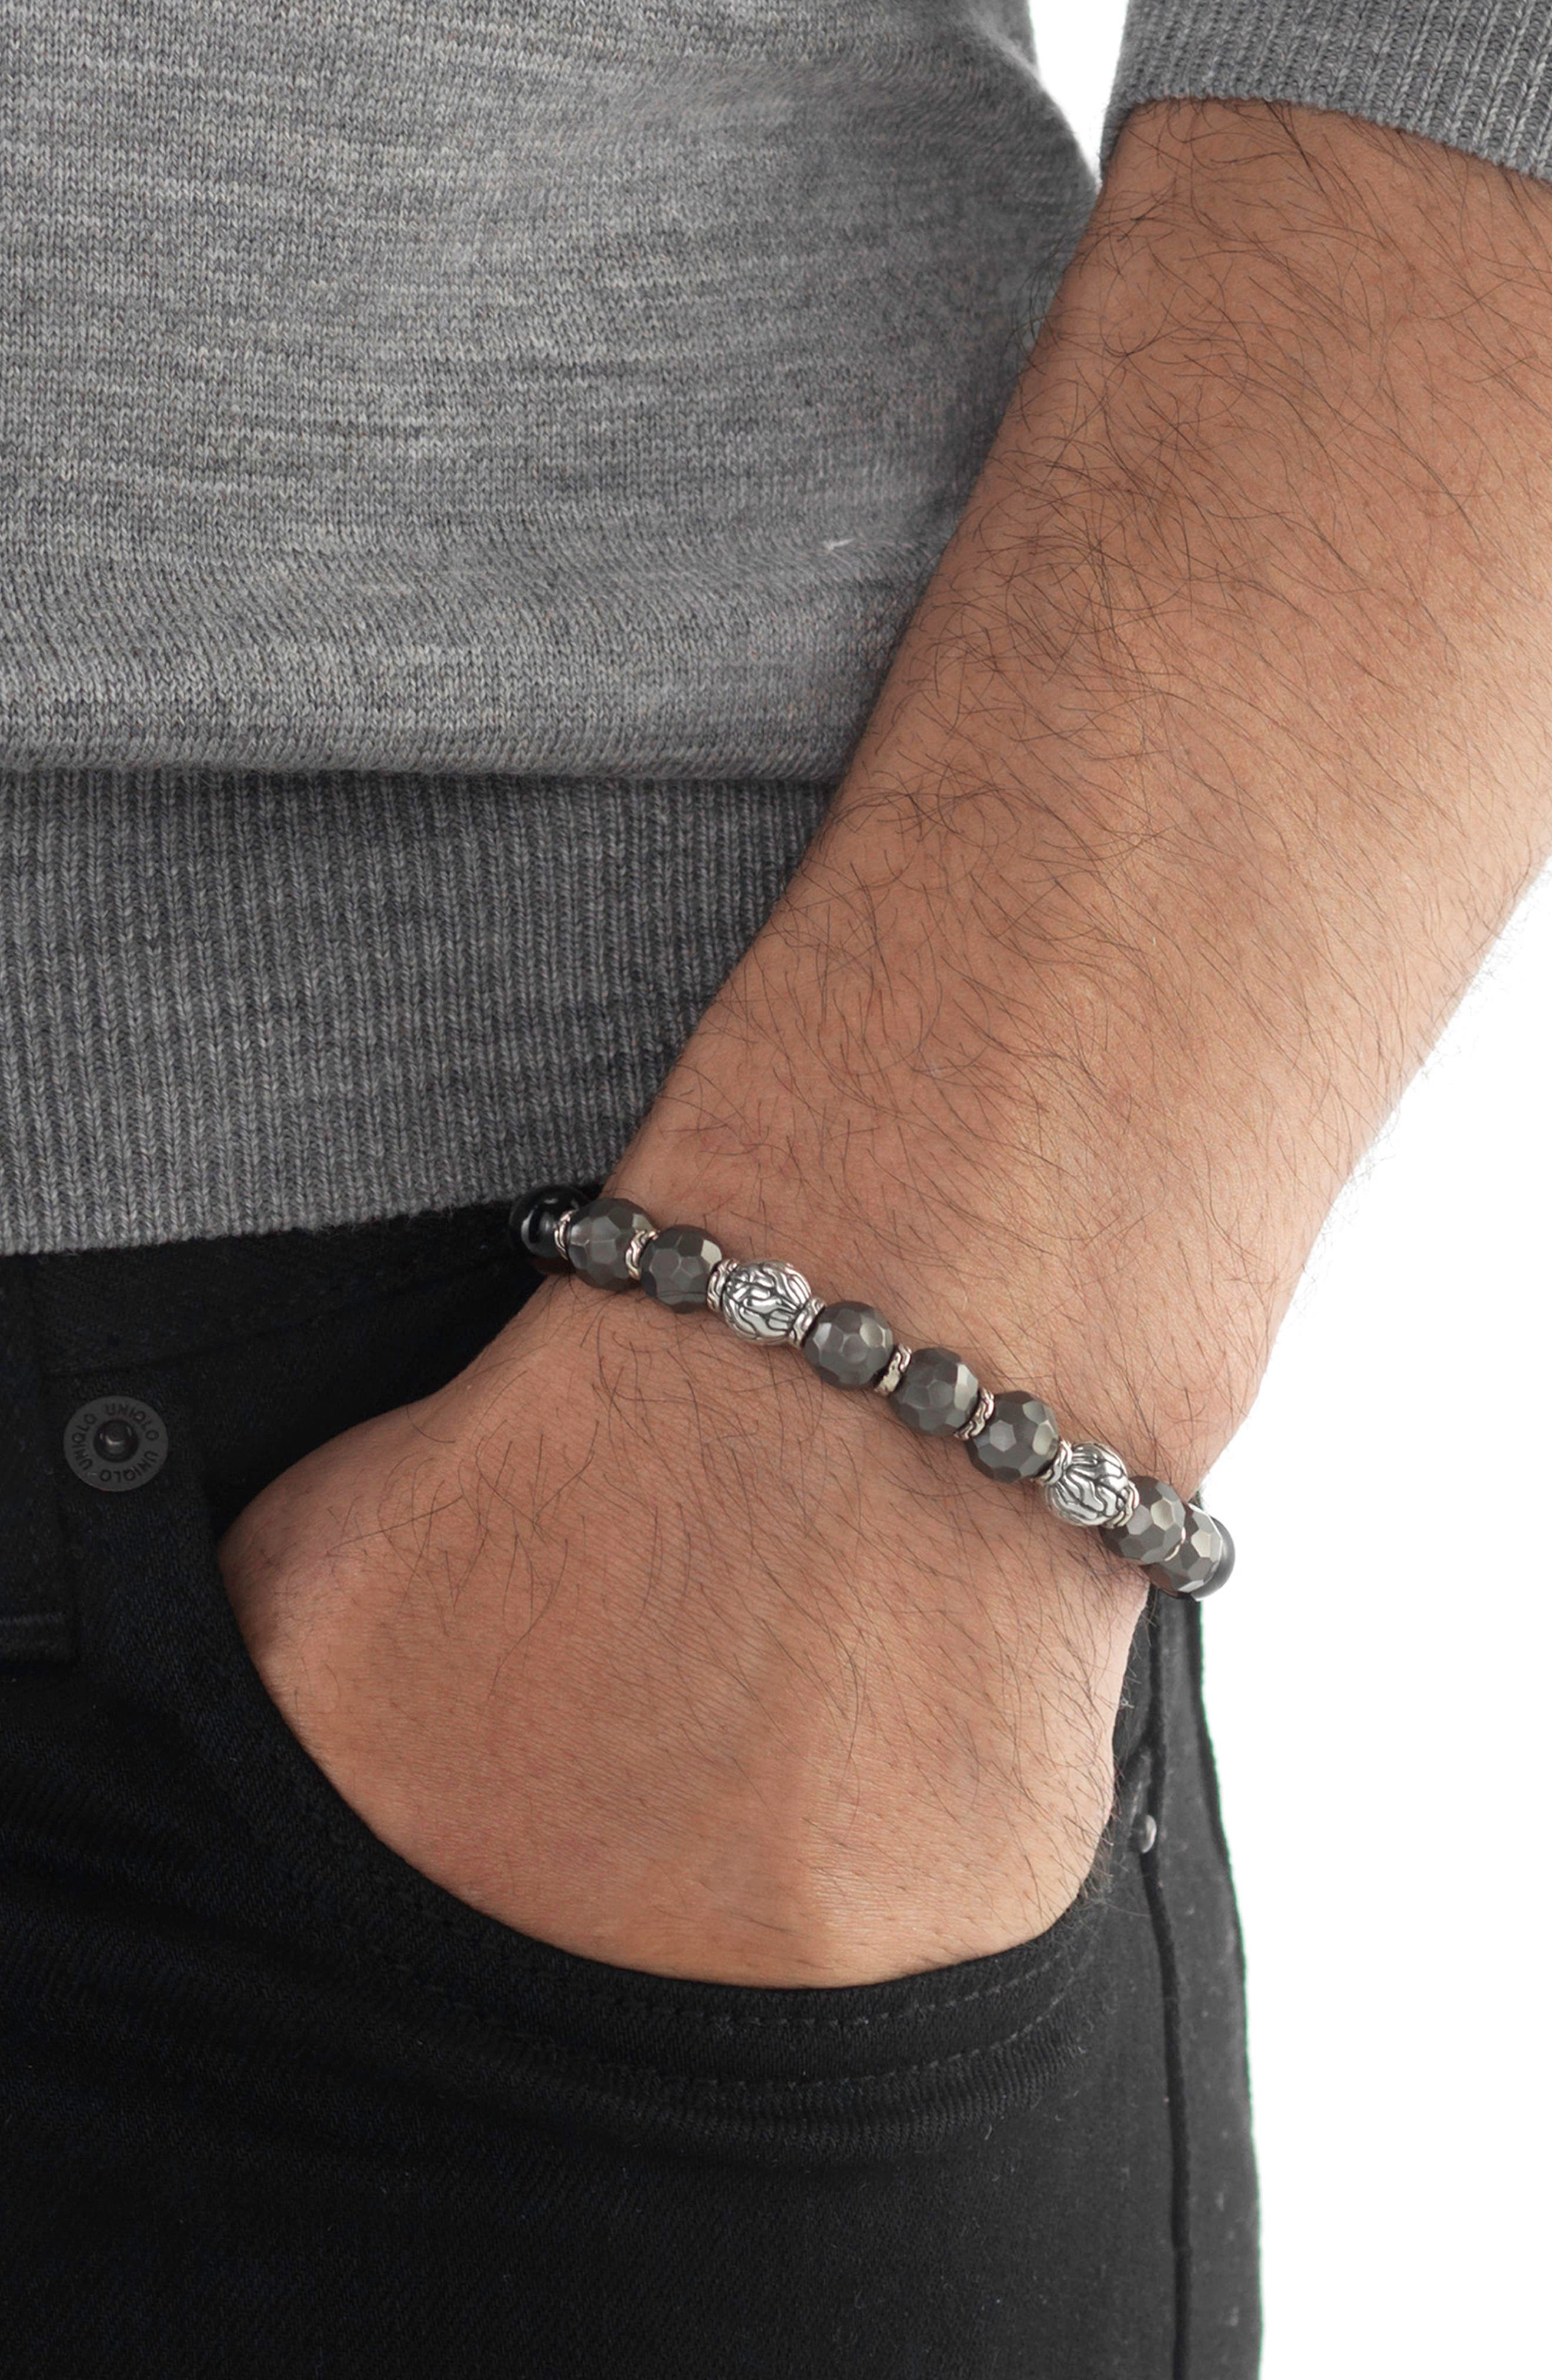 Men's Hammered Bead Bracelet,                             Alternate thumbnail 2, color,                             SILVER/ BLACK TOURMALINE